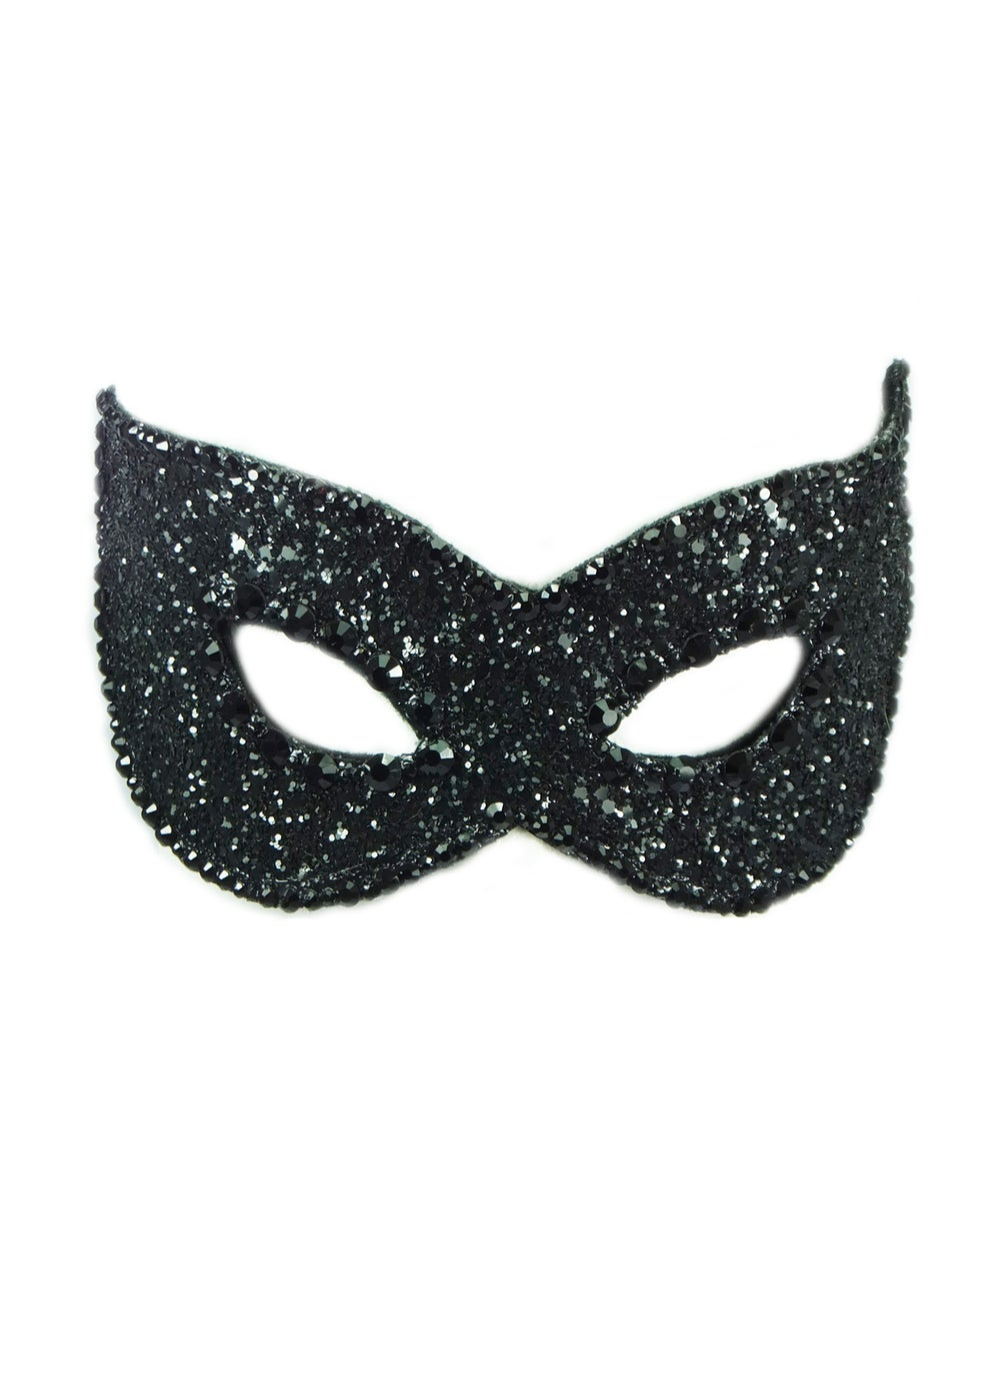 Image of Diamante Sinner Masquerade Mask